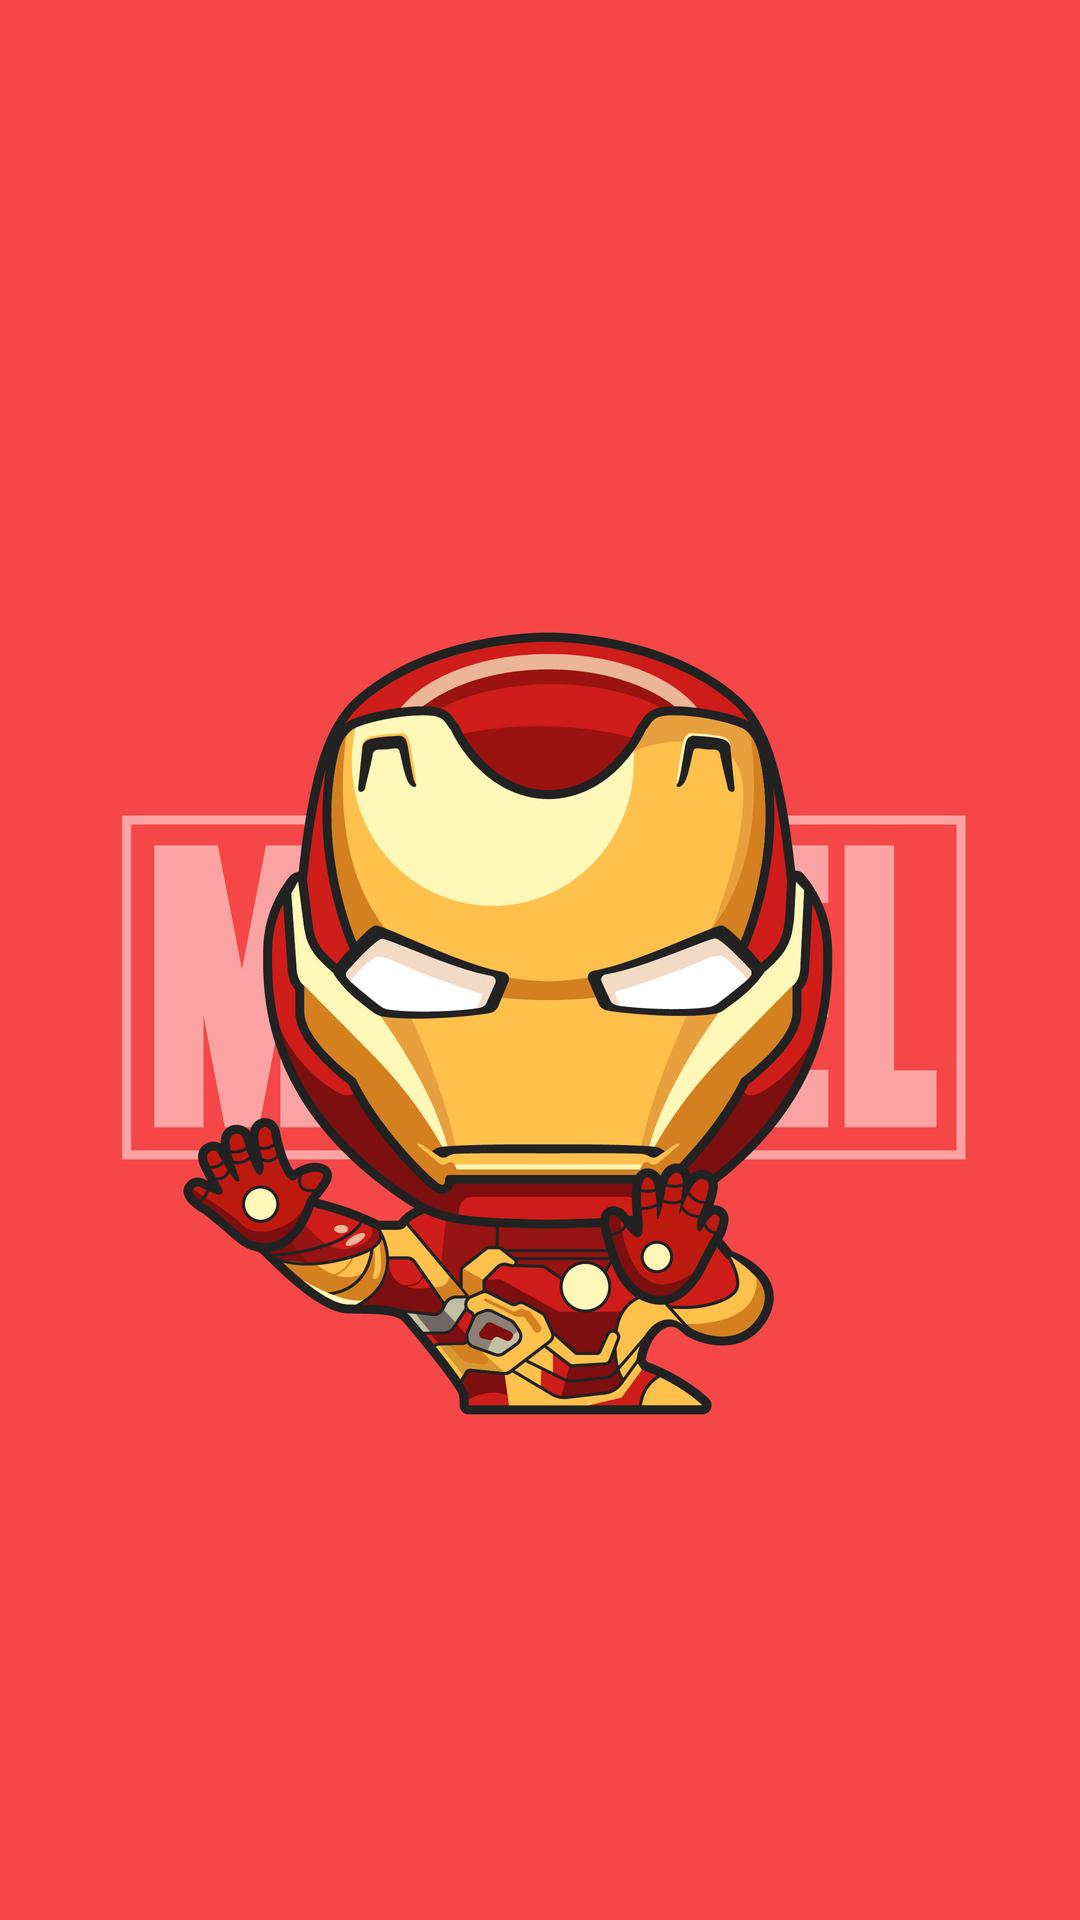 Iron Man Cartoon Wallpaper Iphone Bestpicture1org